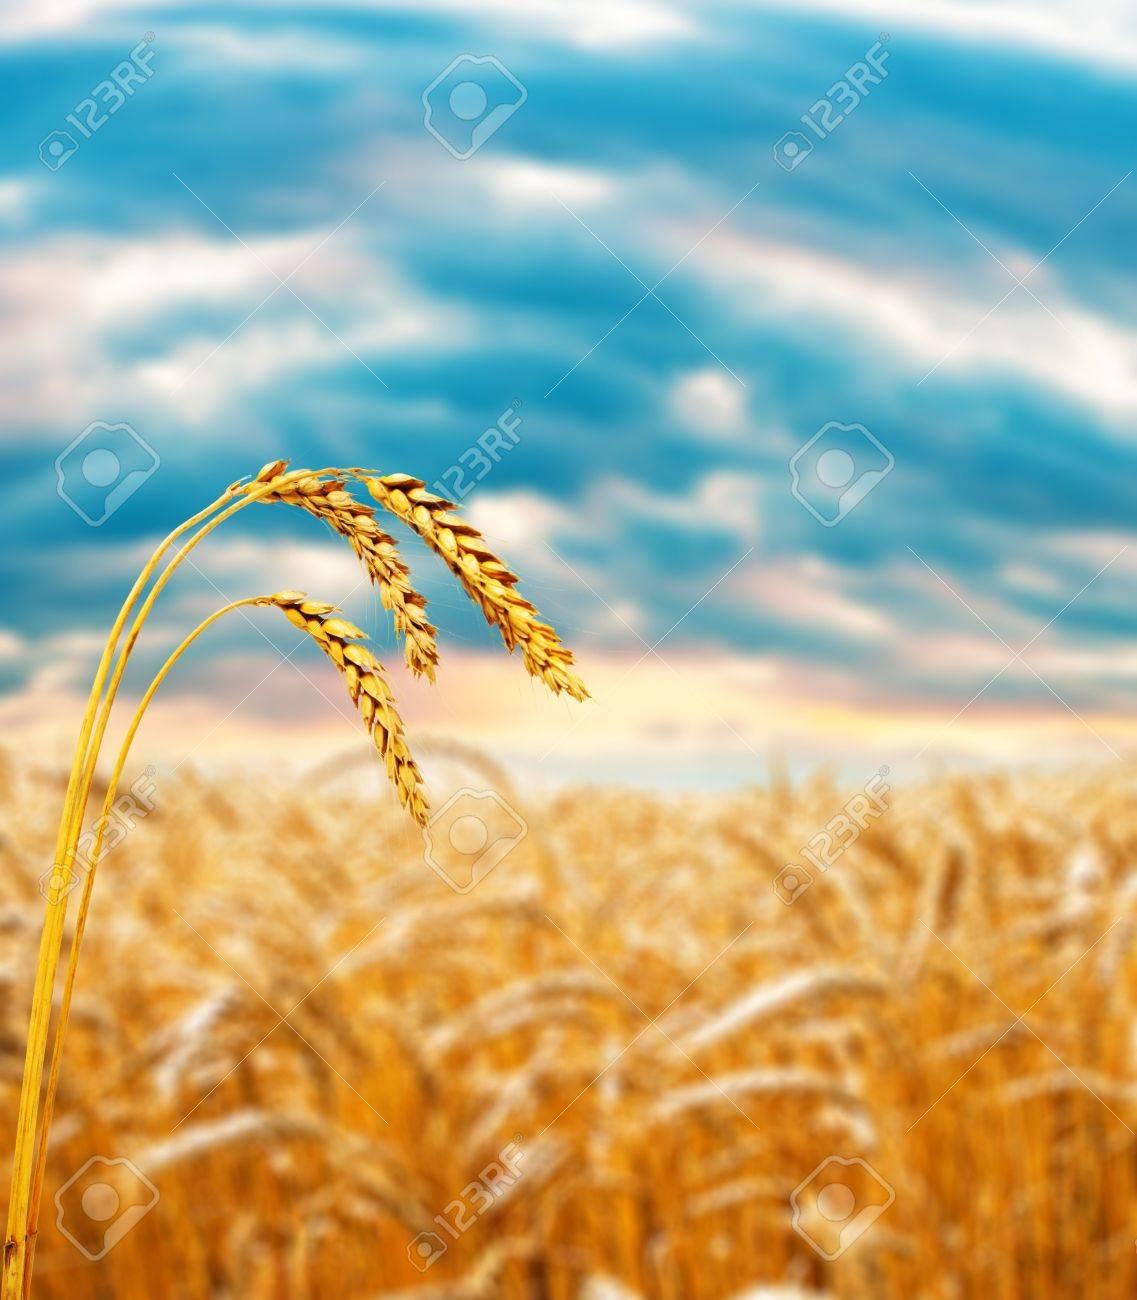 Ripe wheat ear in field under cloudy sky, shallow focus on ear Stock Photo - 4630178